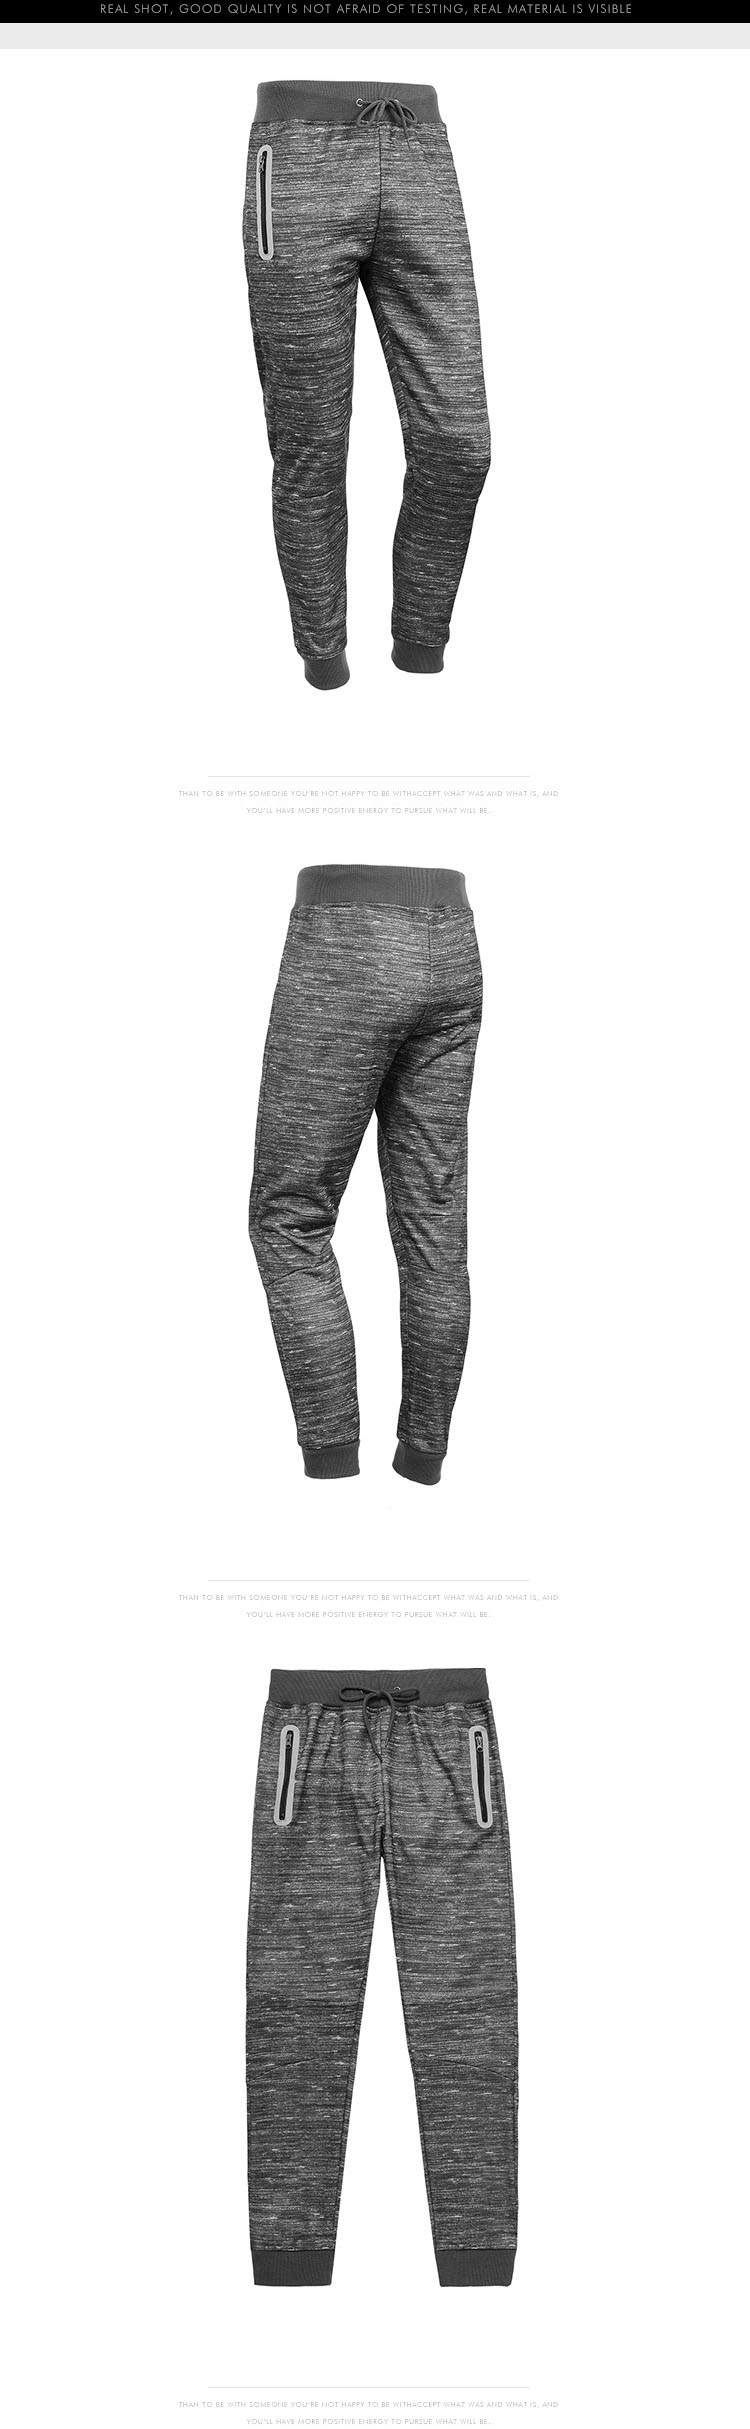 Aolamegs Men Casual Jogger Pants Sportwear 2017 Joggingrunning Mens Sweatpants Drawstring Pants High Quality Gyms Clothing (10)